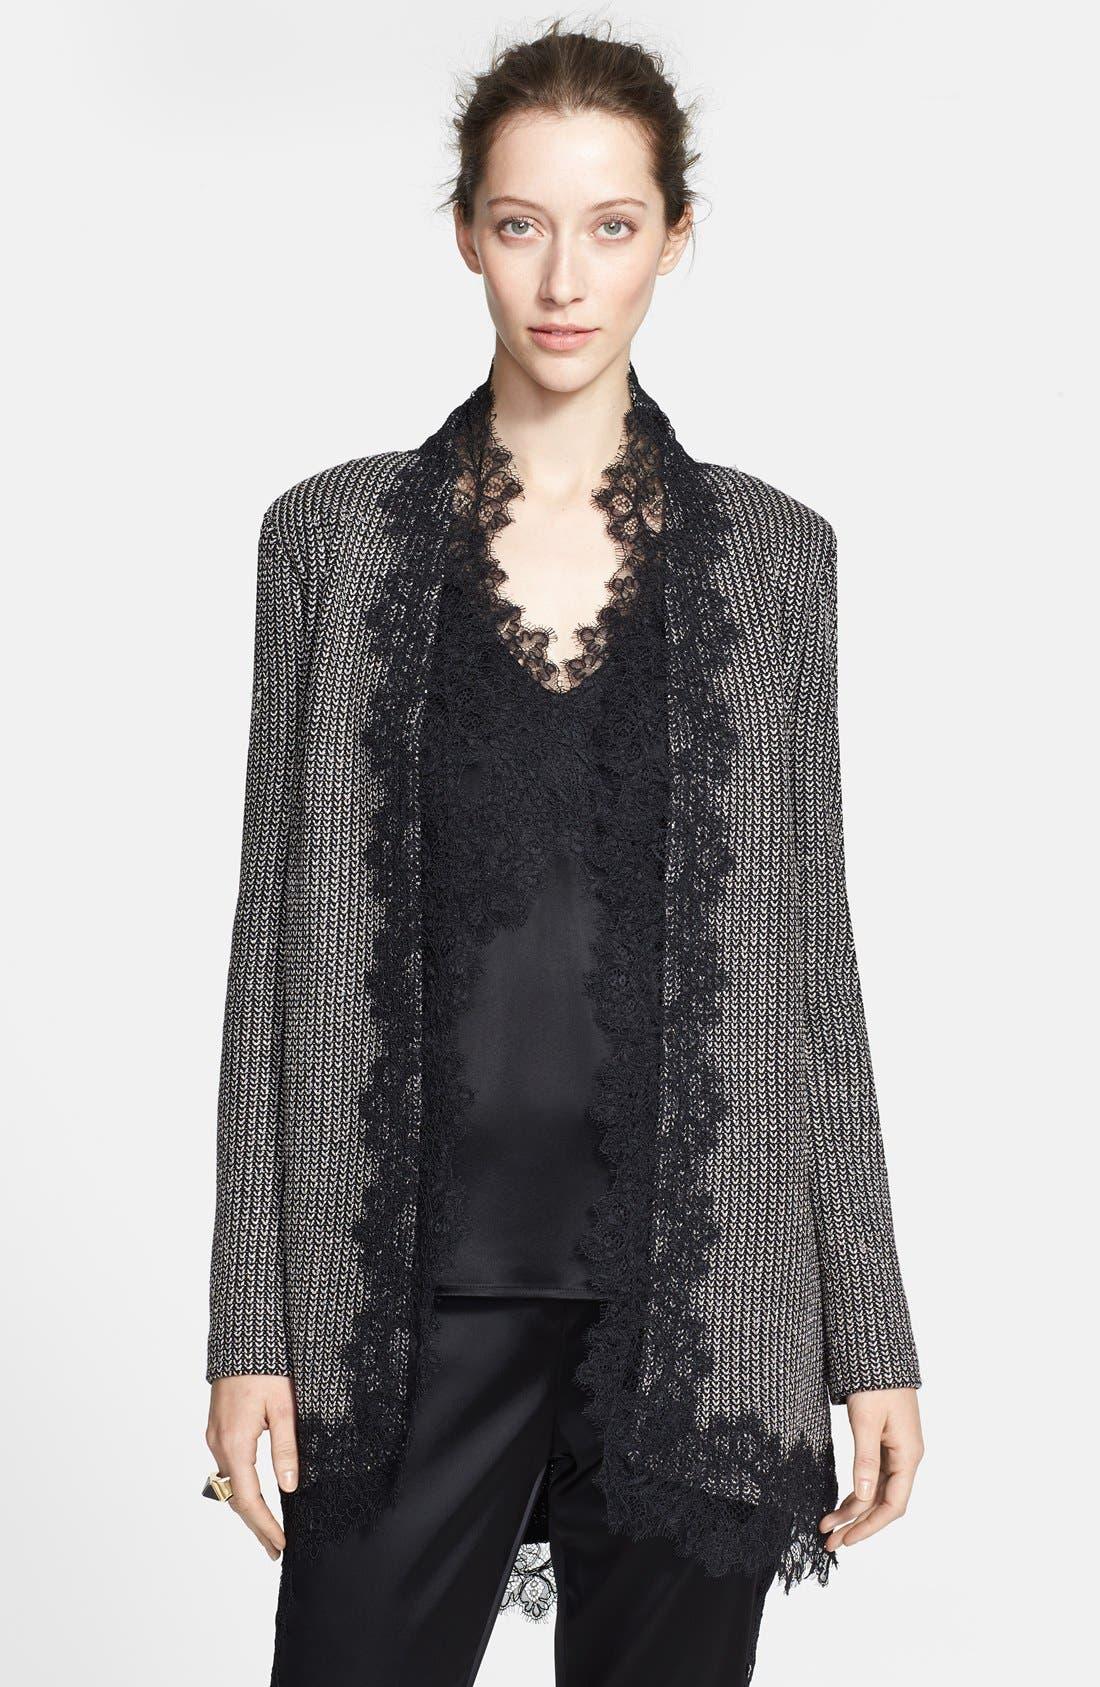 Alternate Image 1 Selected - St. John Collection Lace Trim Metallic Micro Knit Jacket